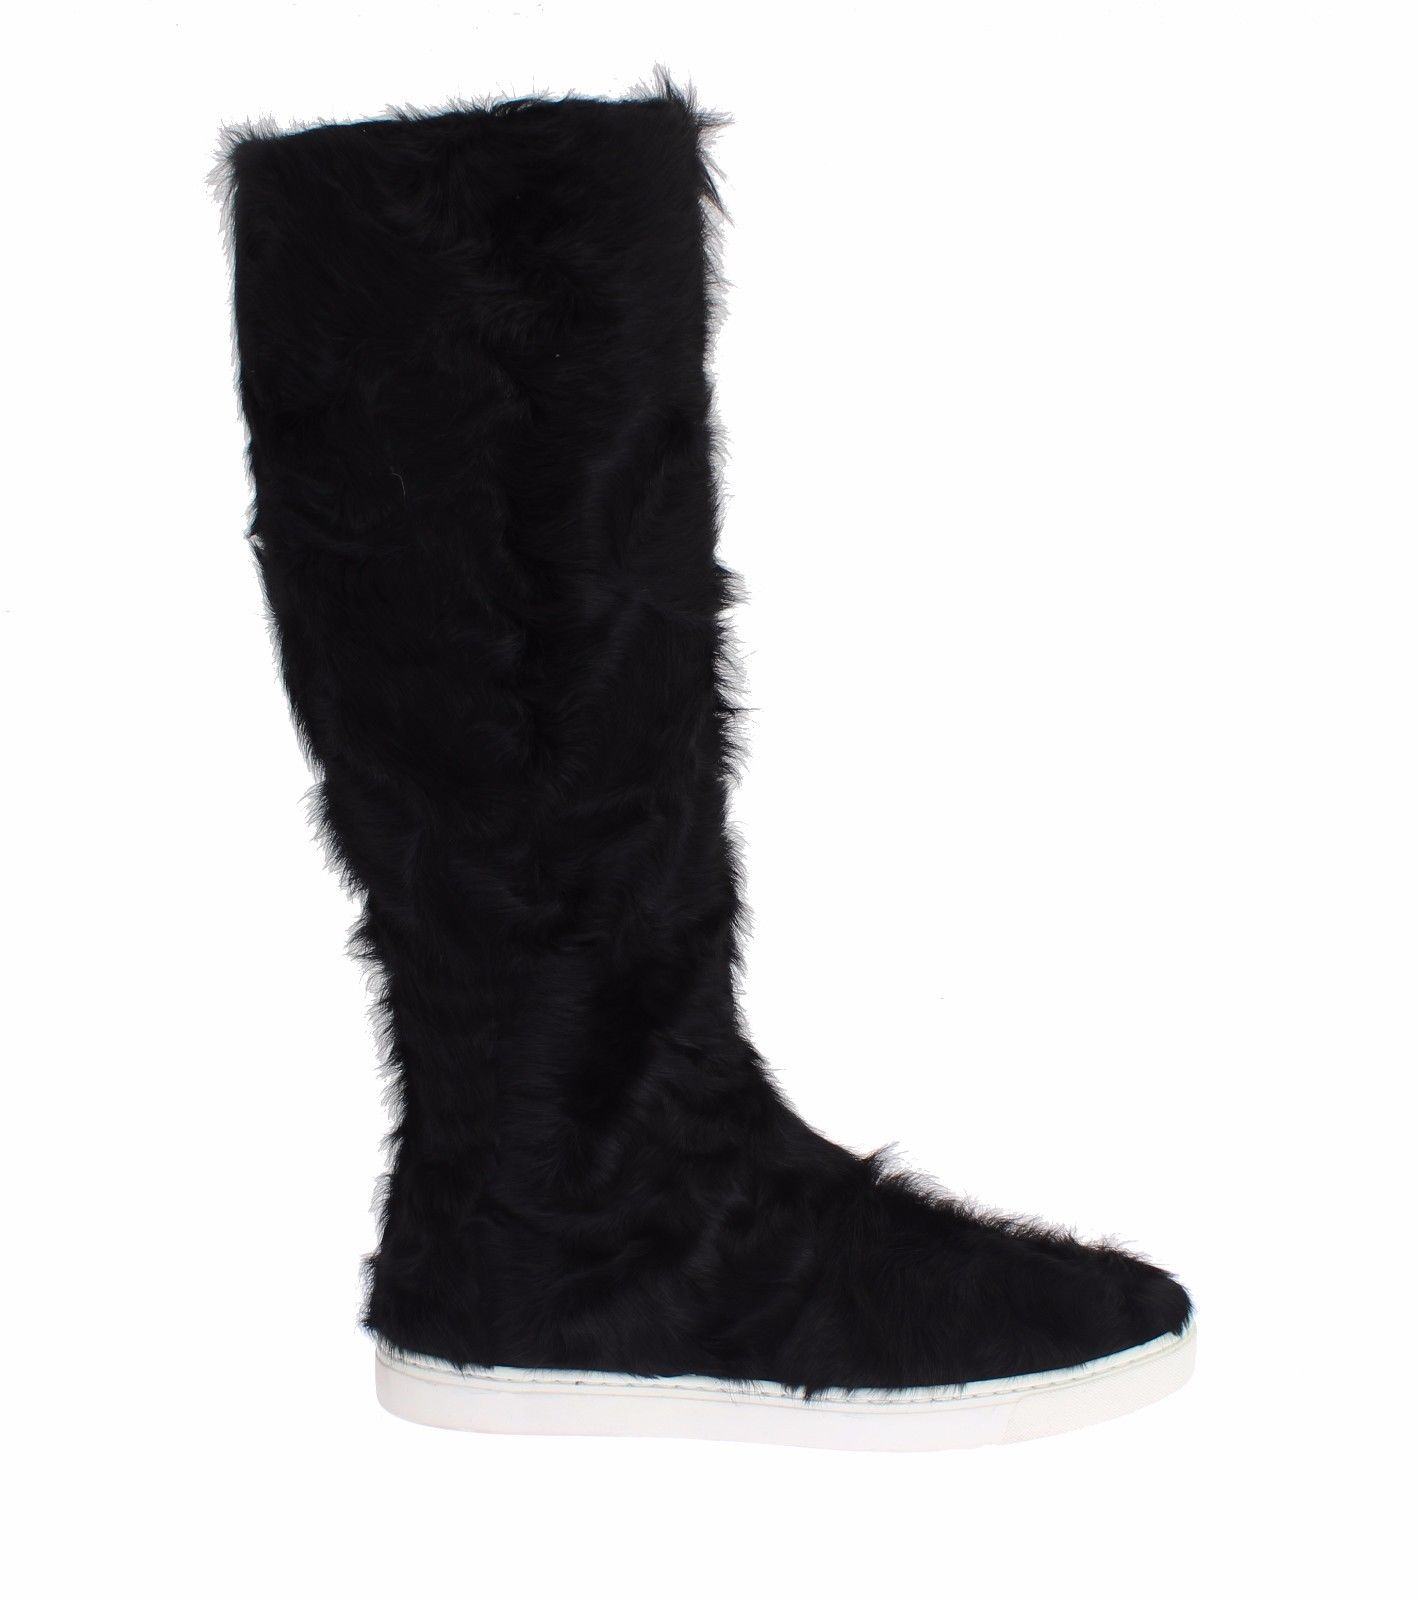 Black Xiangao Lamb Fur Leather Boots - EU35/US4.5